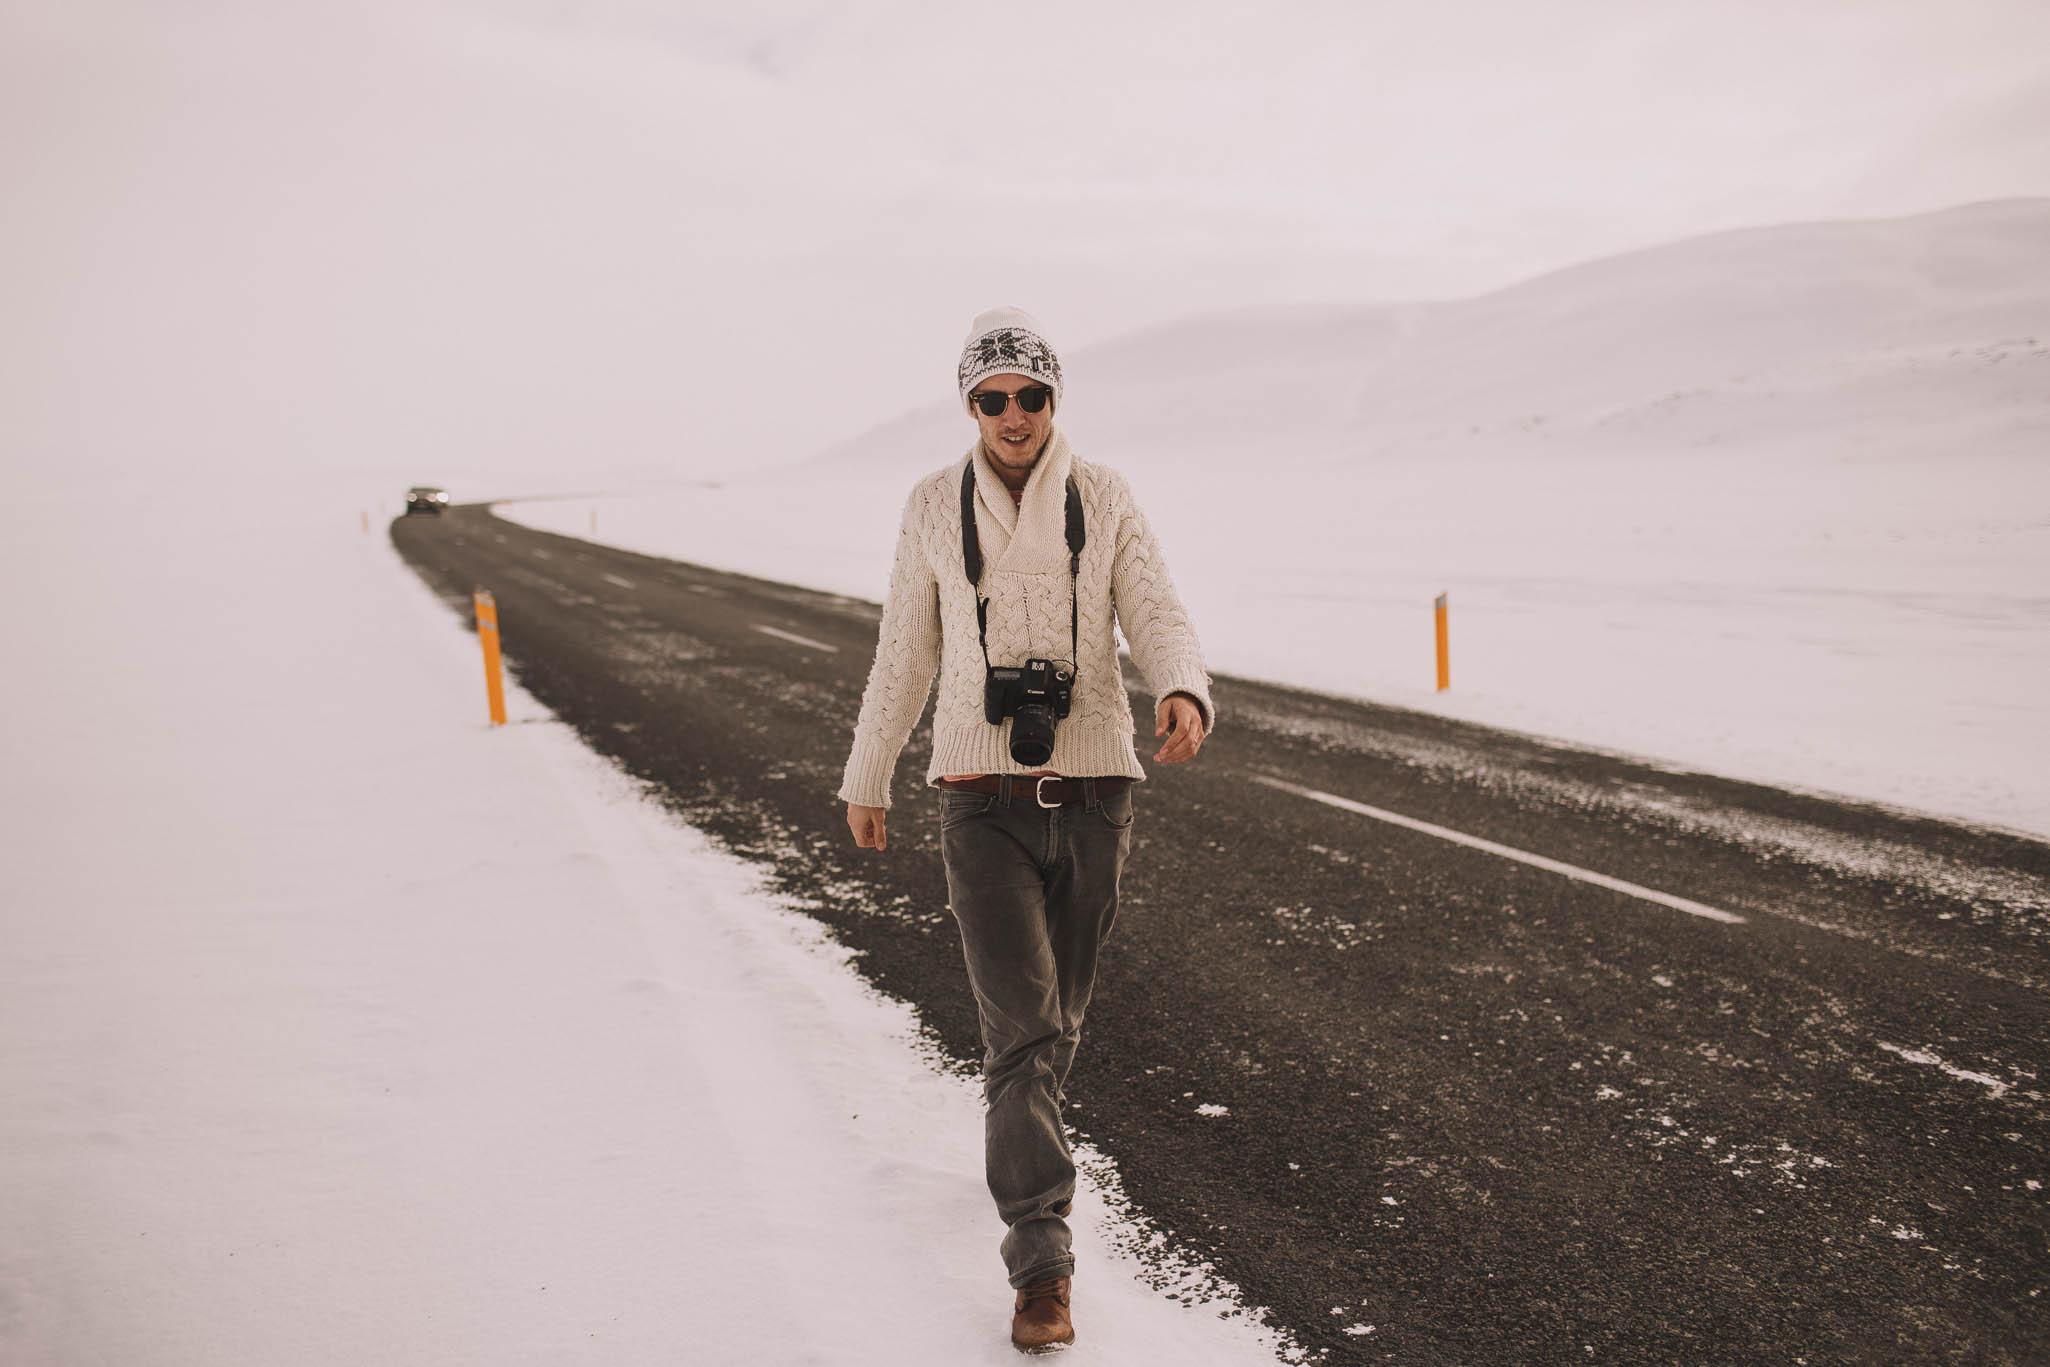 Road-trip-Islande-Iceland-Voyage-Travel-Portrait-Jérémy-Boyer-Hverir-Steam-mountains-montagnes-vapeur-6.jpg